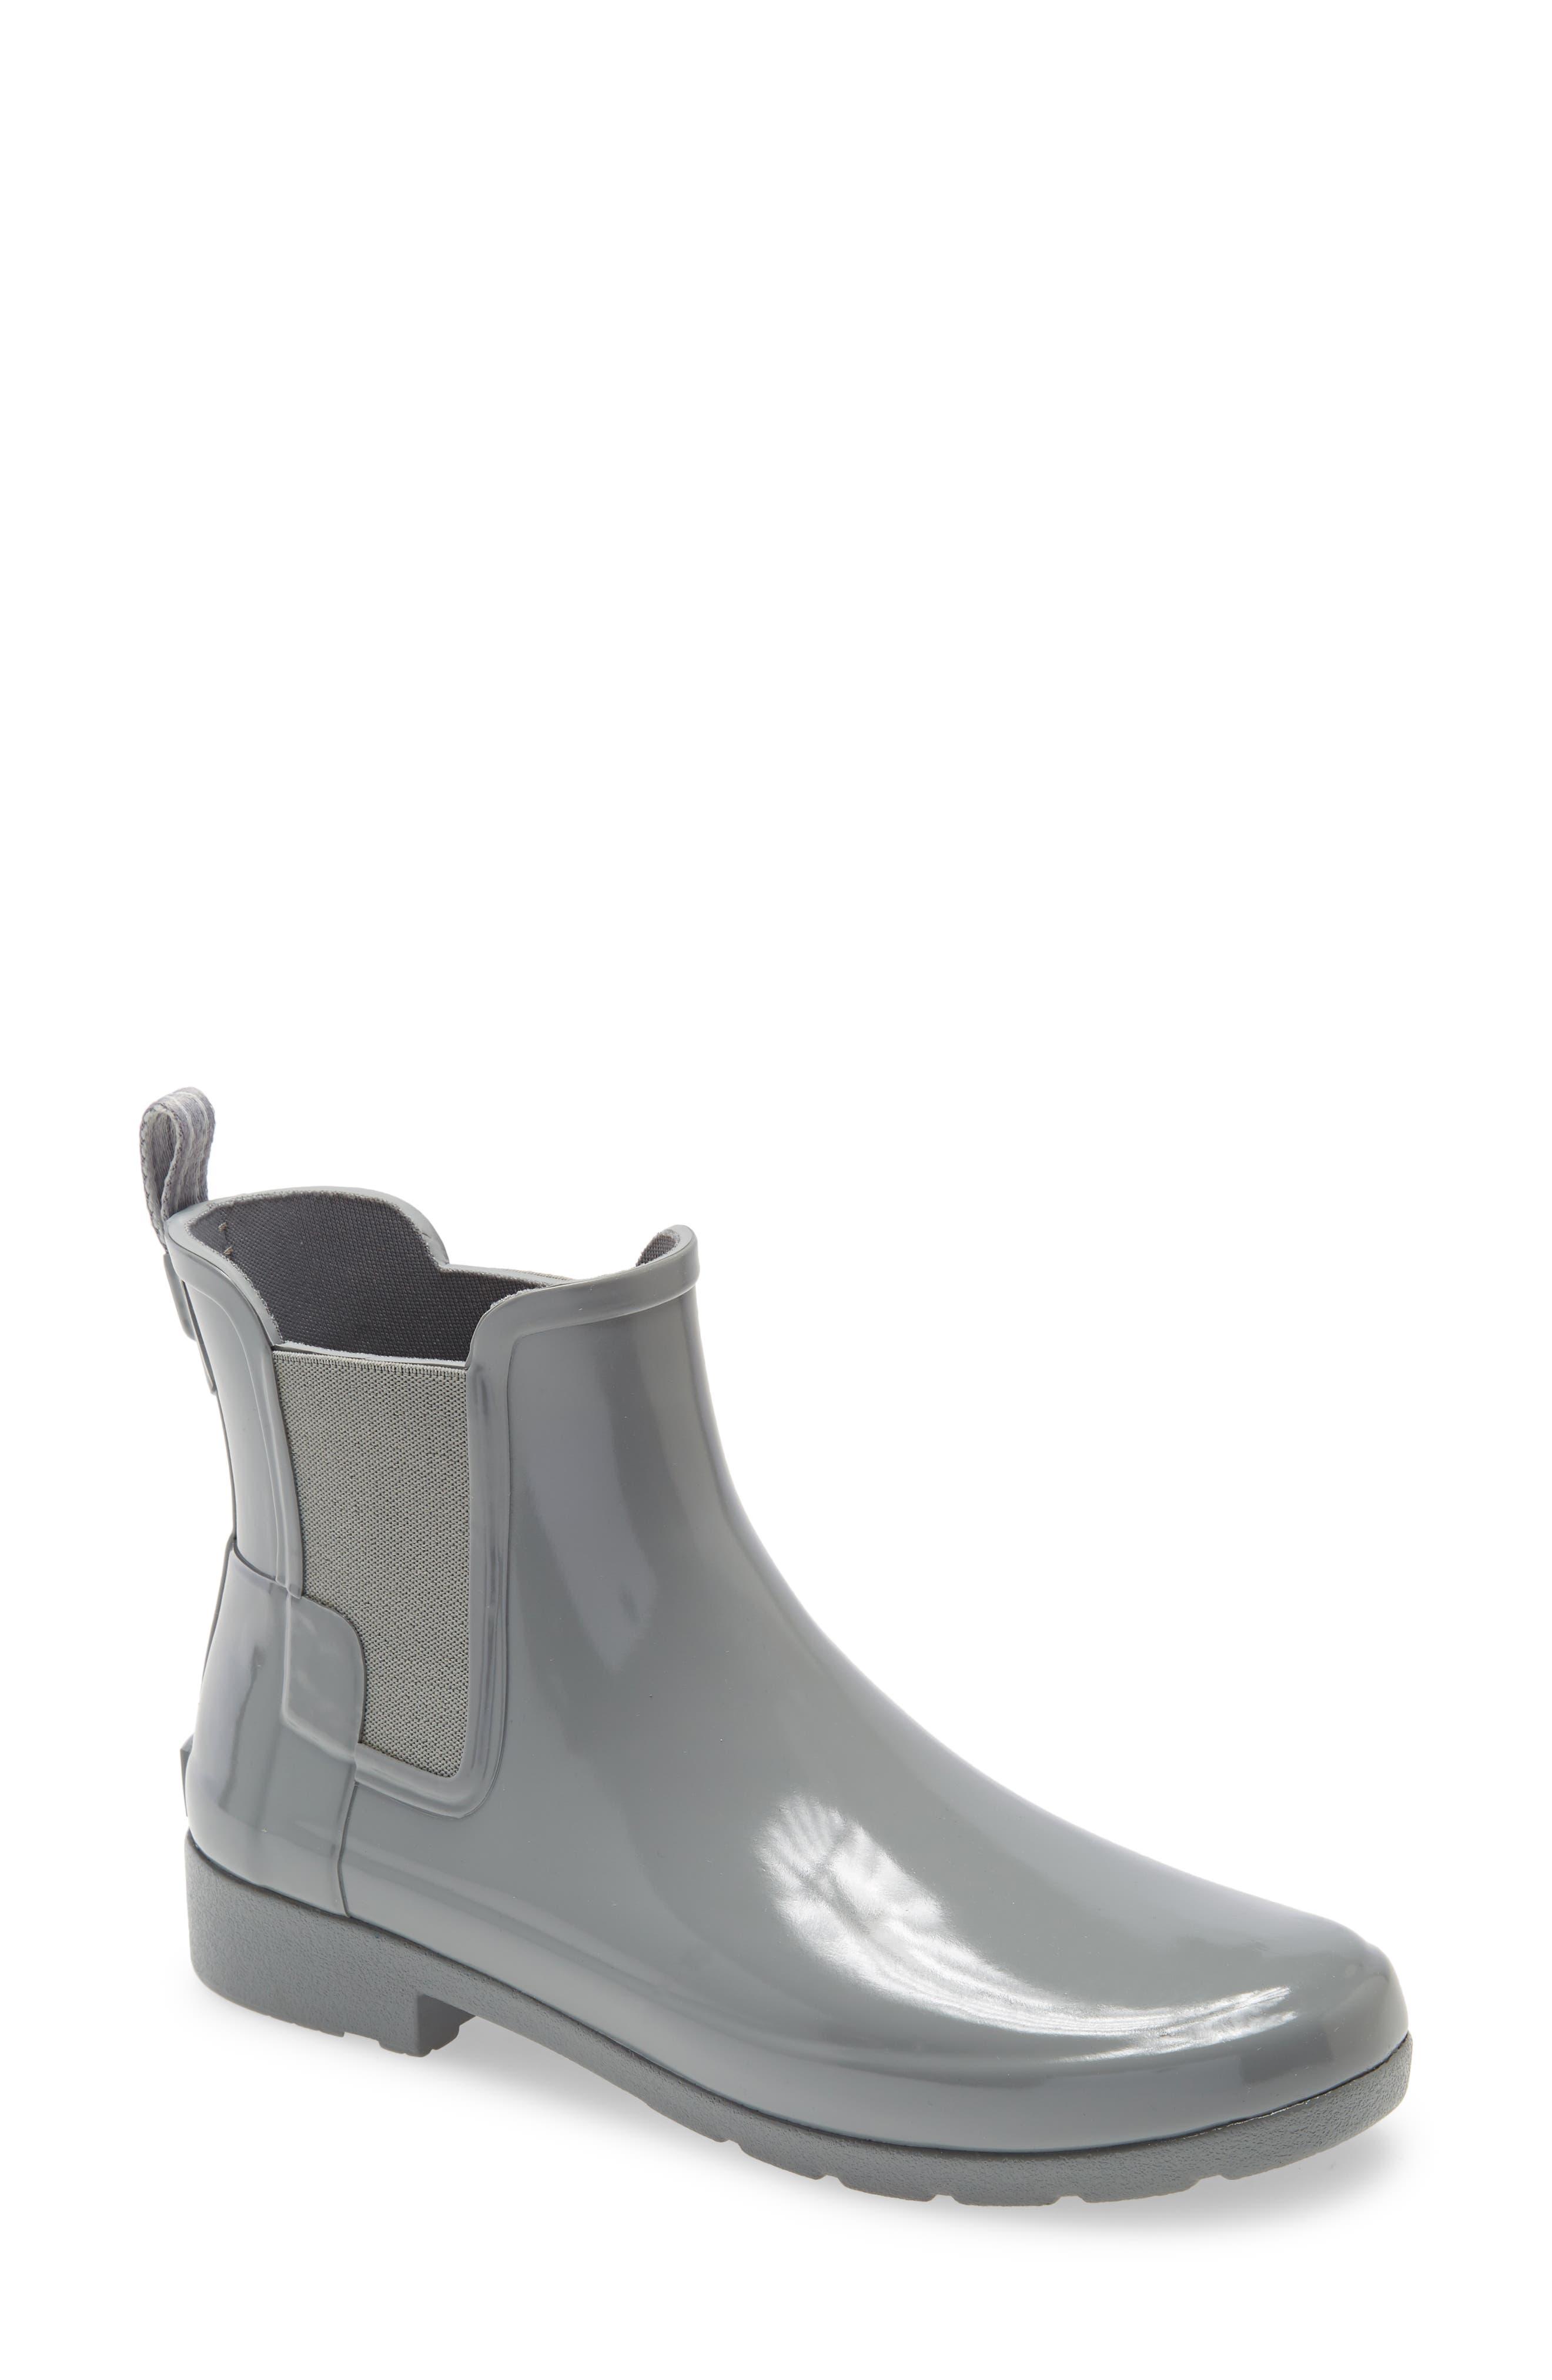 Image of Hunter Original Refined Chelsea Waterproof Rain Boot